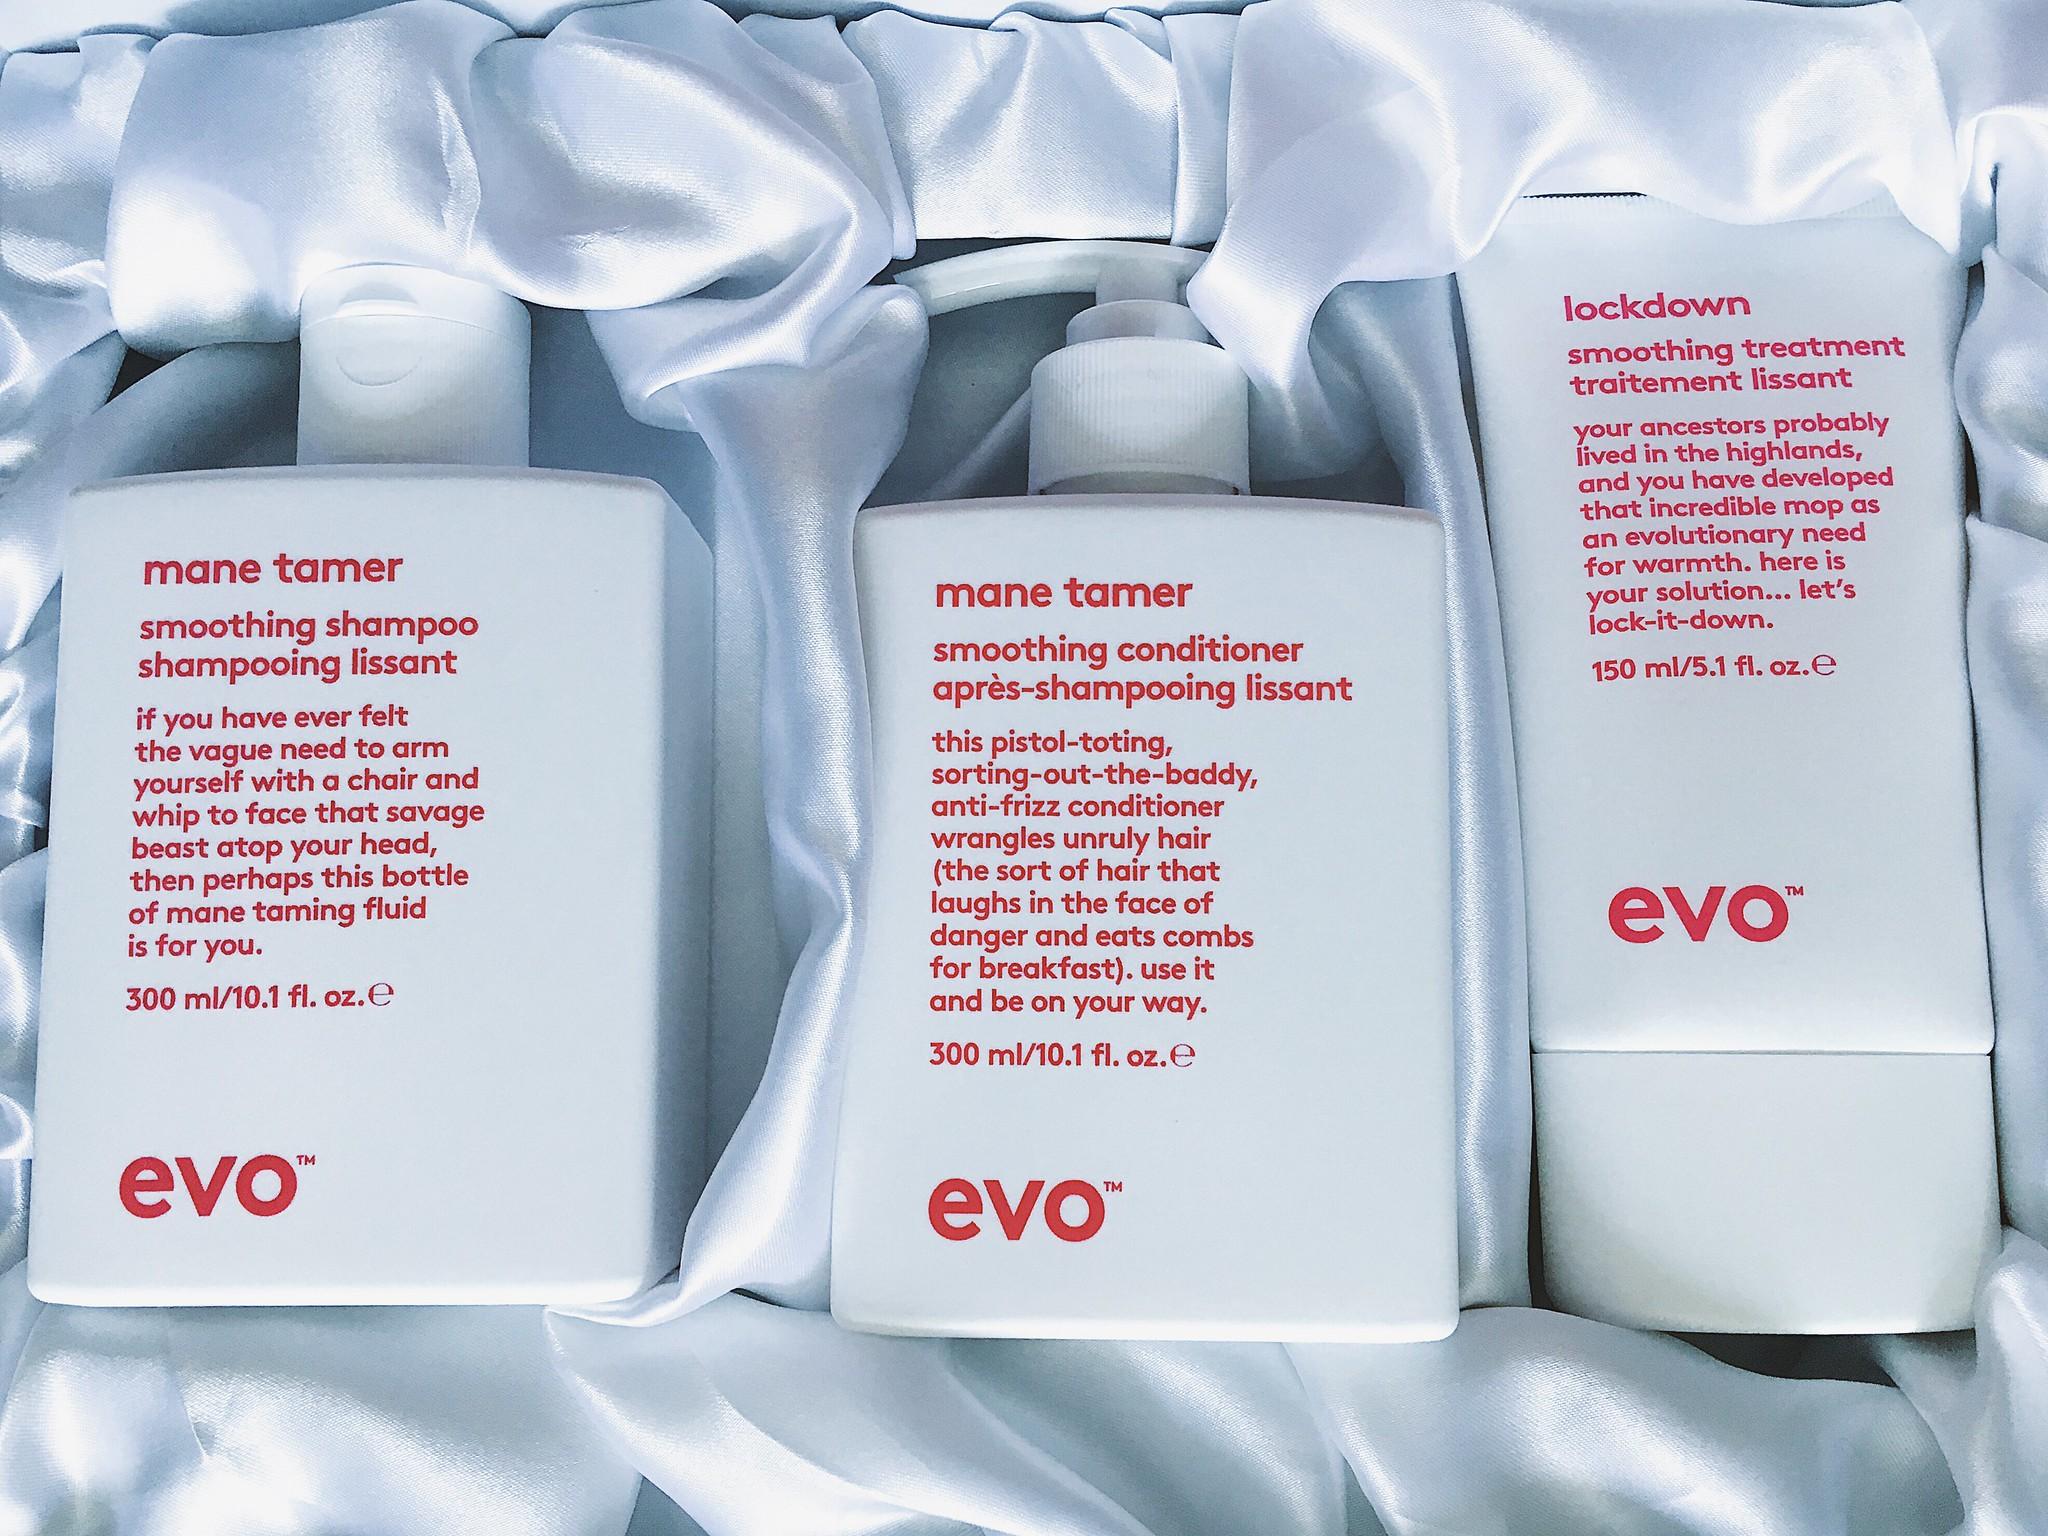 evo hair smooth